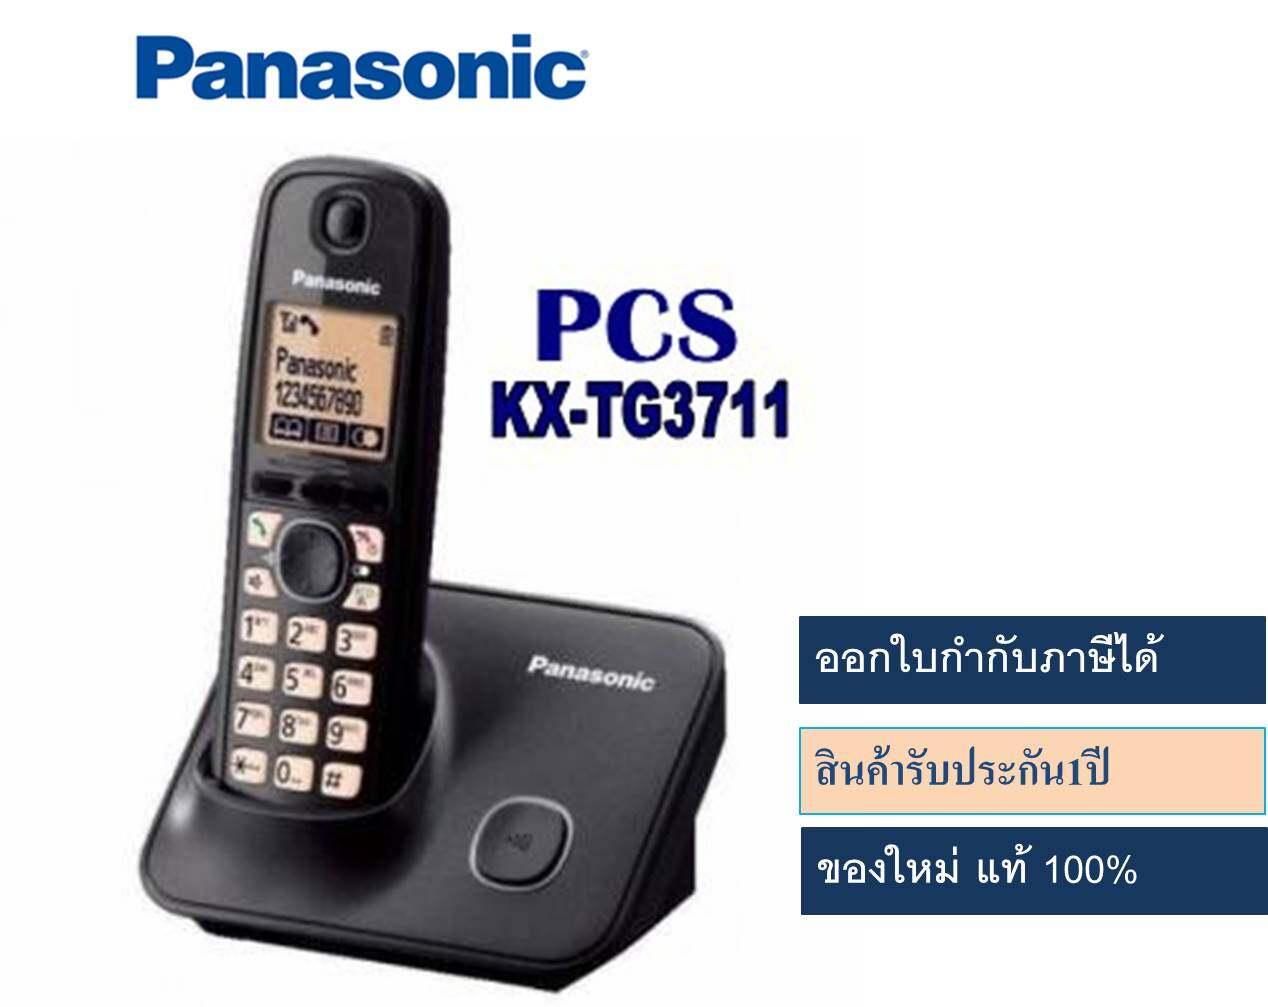 Panasonic เครื่องโทรศัพท์ไร้สาย 2.4GHz สีดำ/เงิน รุ่น KX-TG3711 Cordless Phone ราคาถูก โทรศัพท์บ้านแบบไร้สาย โทรศัพท์บ้าน ออฟฟิศ สำนักงาน ใช้ร่วมกับตู้